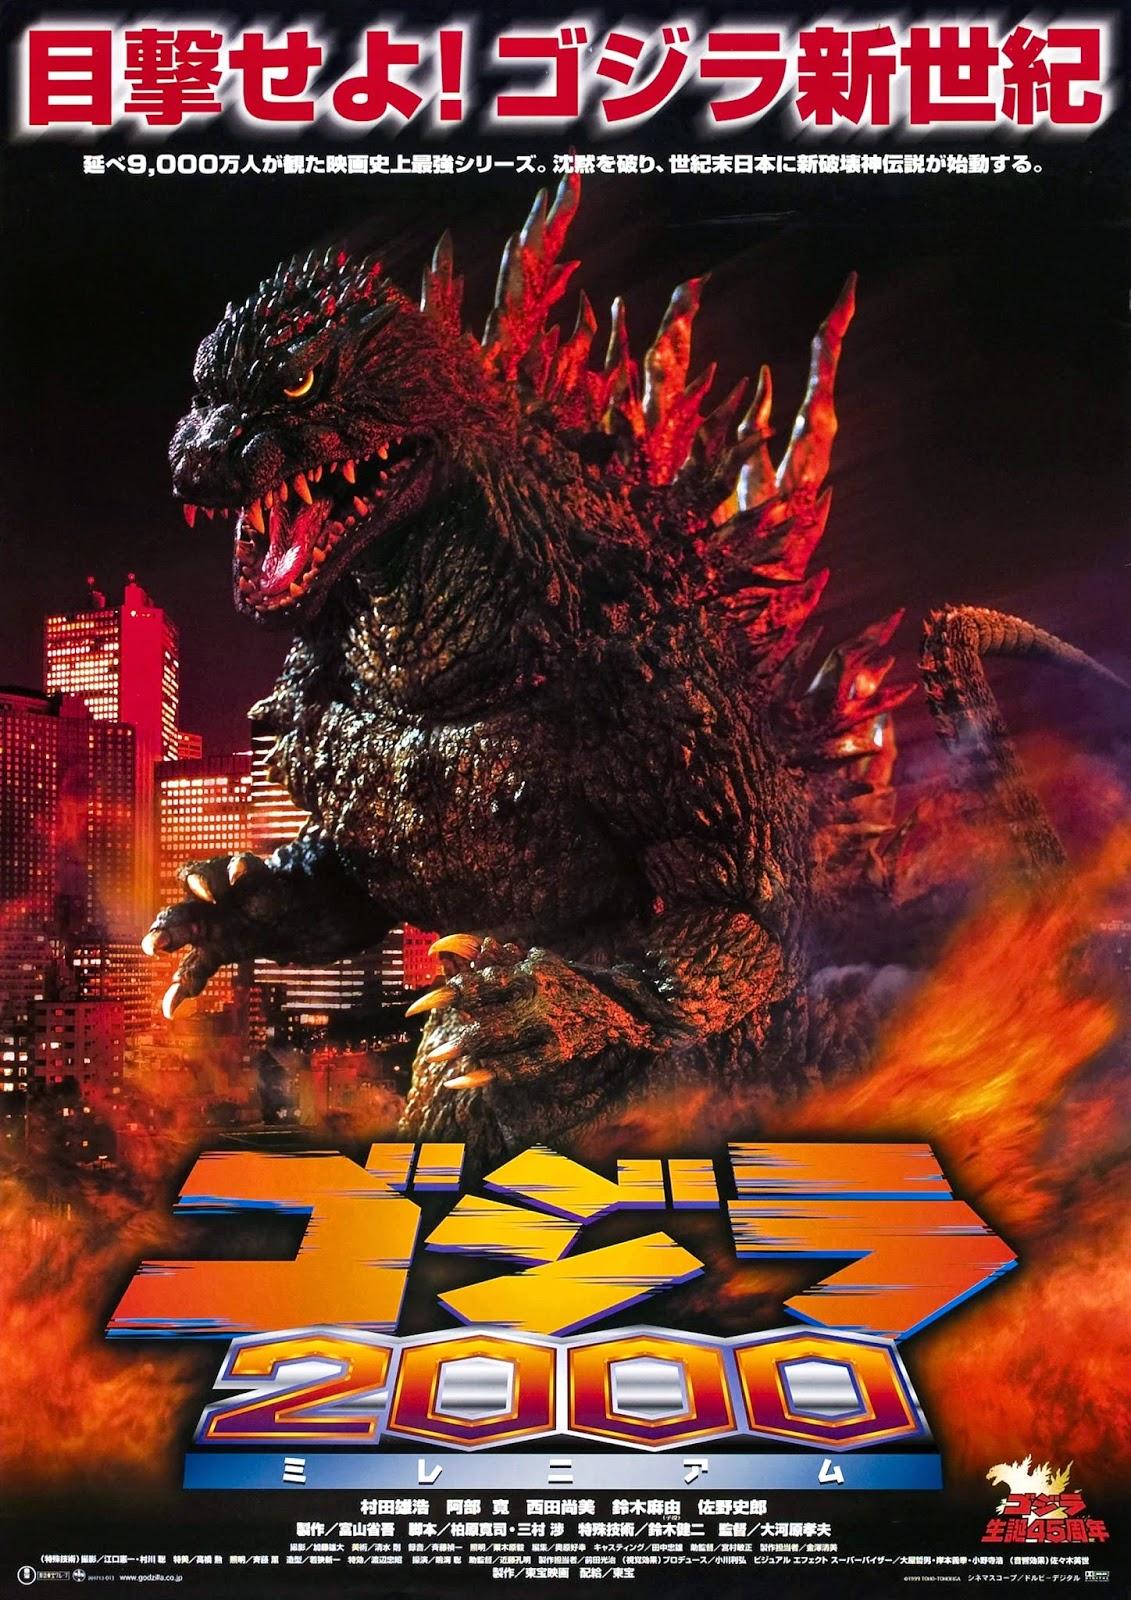 http://fr.wikipedia.org/wiki/Godzilla_2000